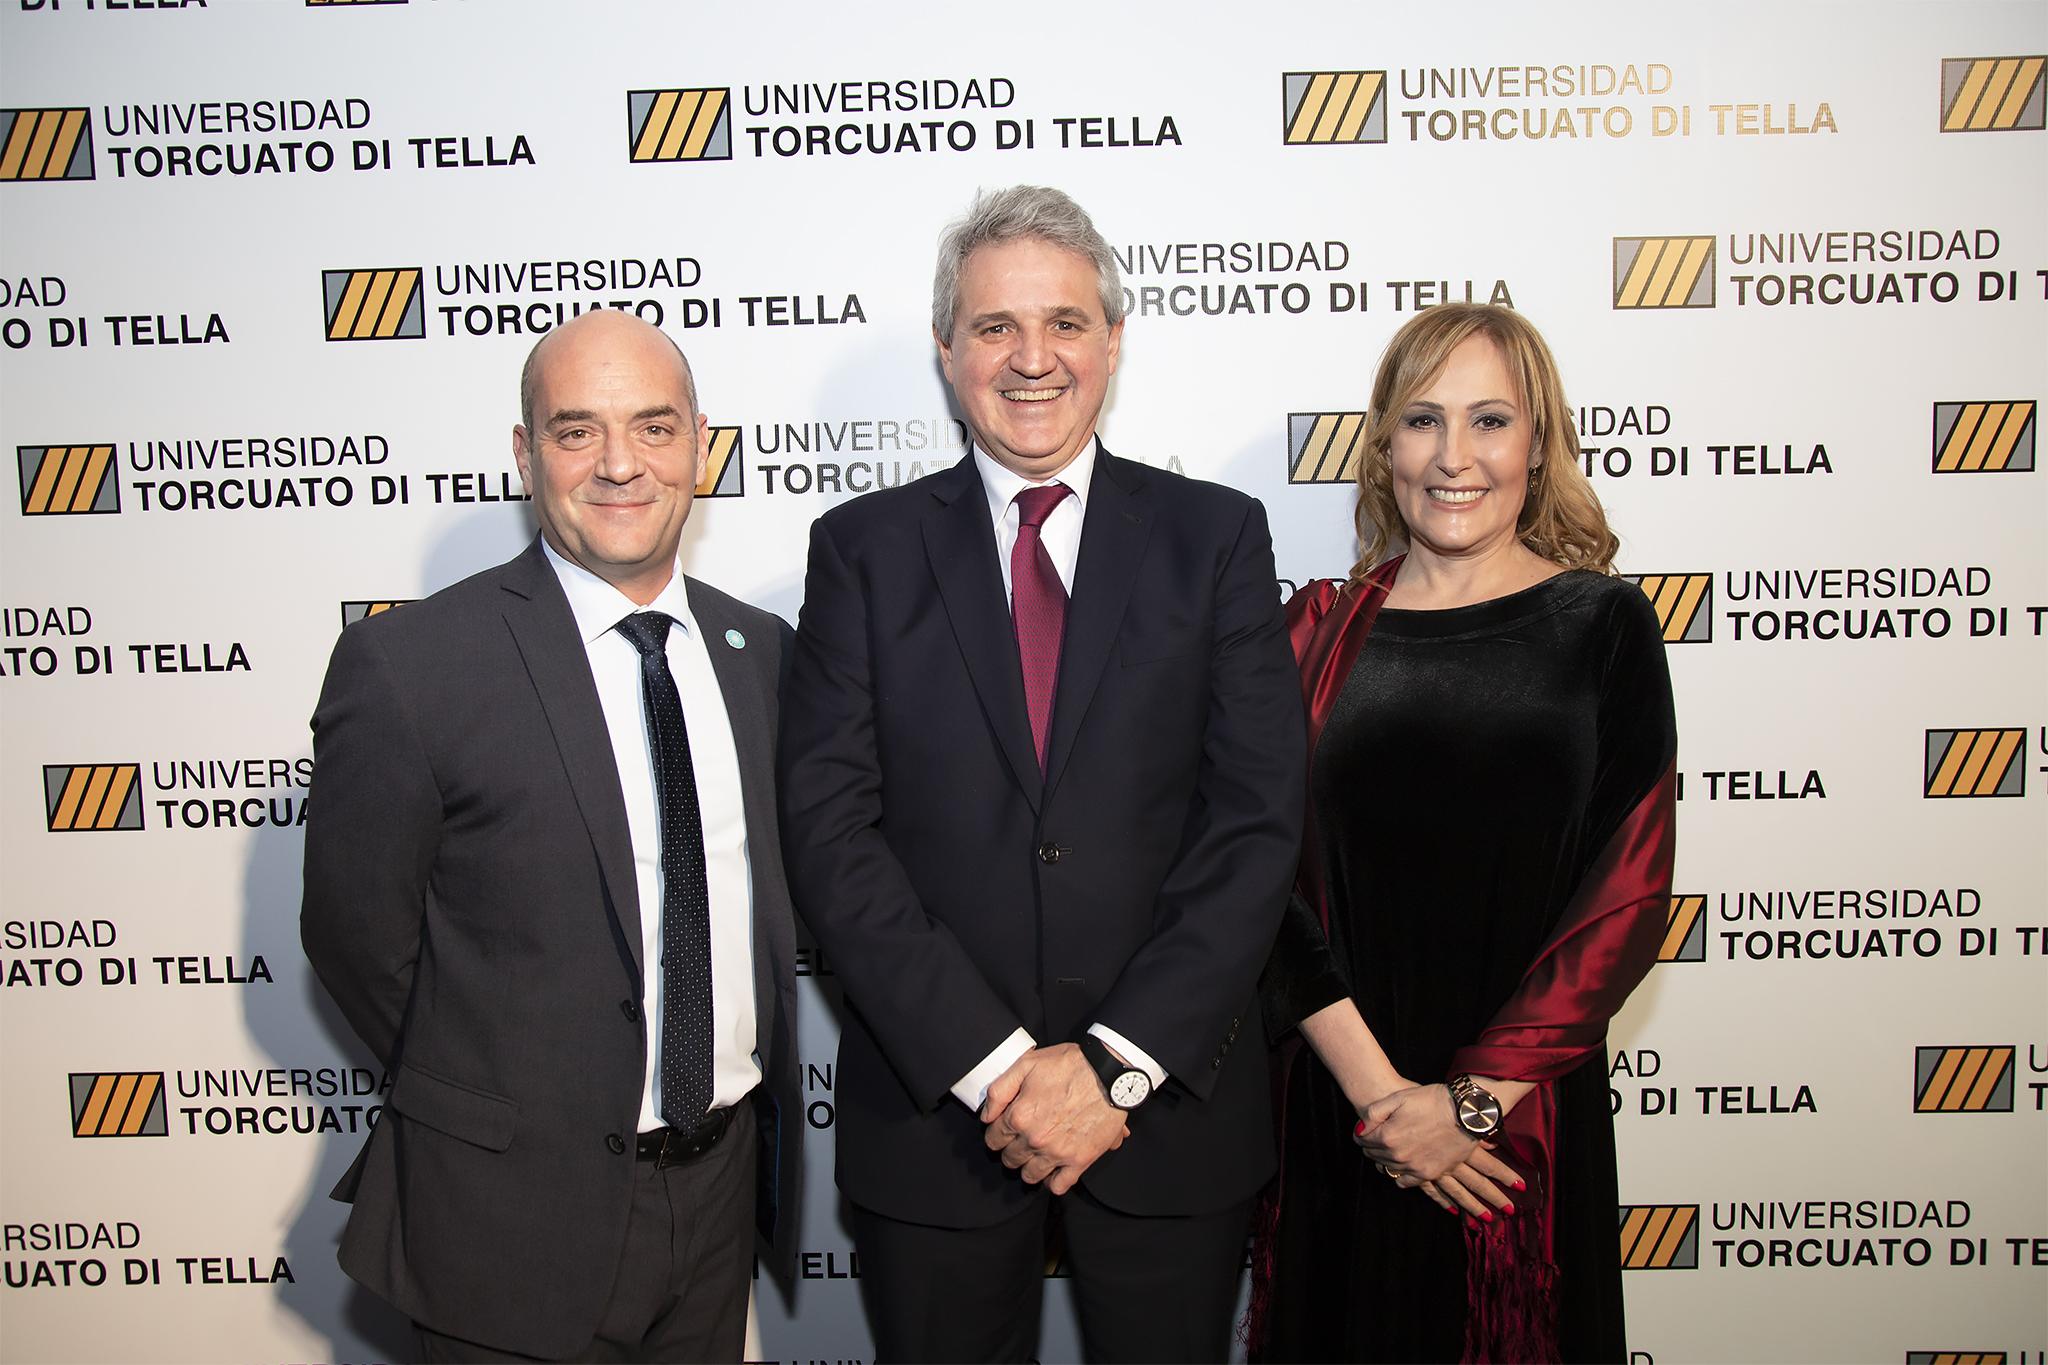 Juan Pablo Lichtmajer, Juan José Cruces y Silvina Gvirtz